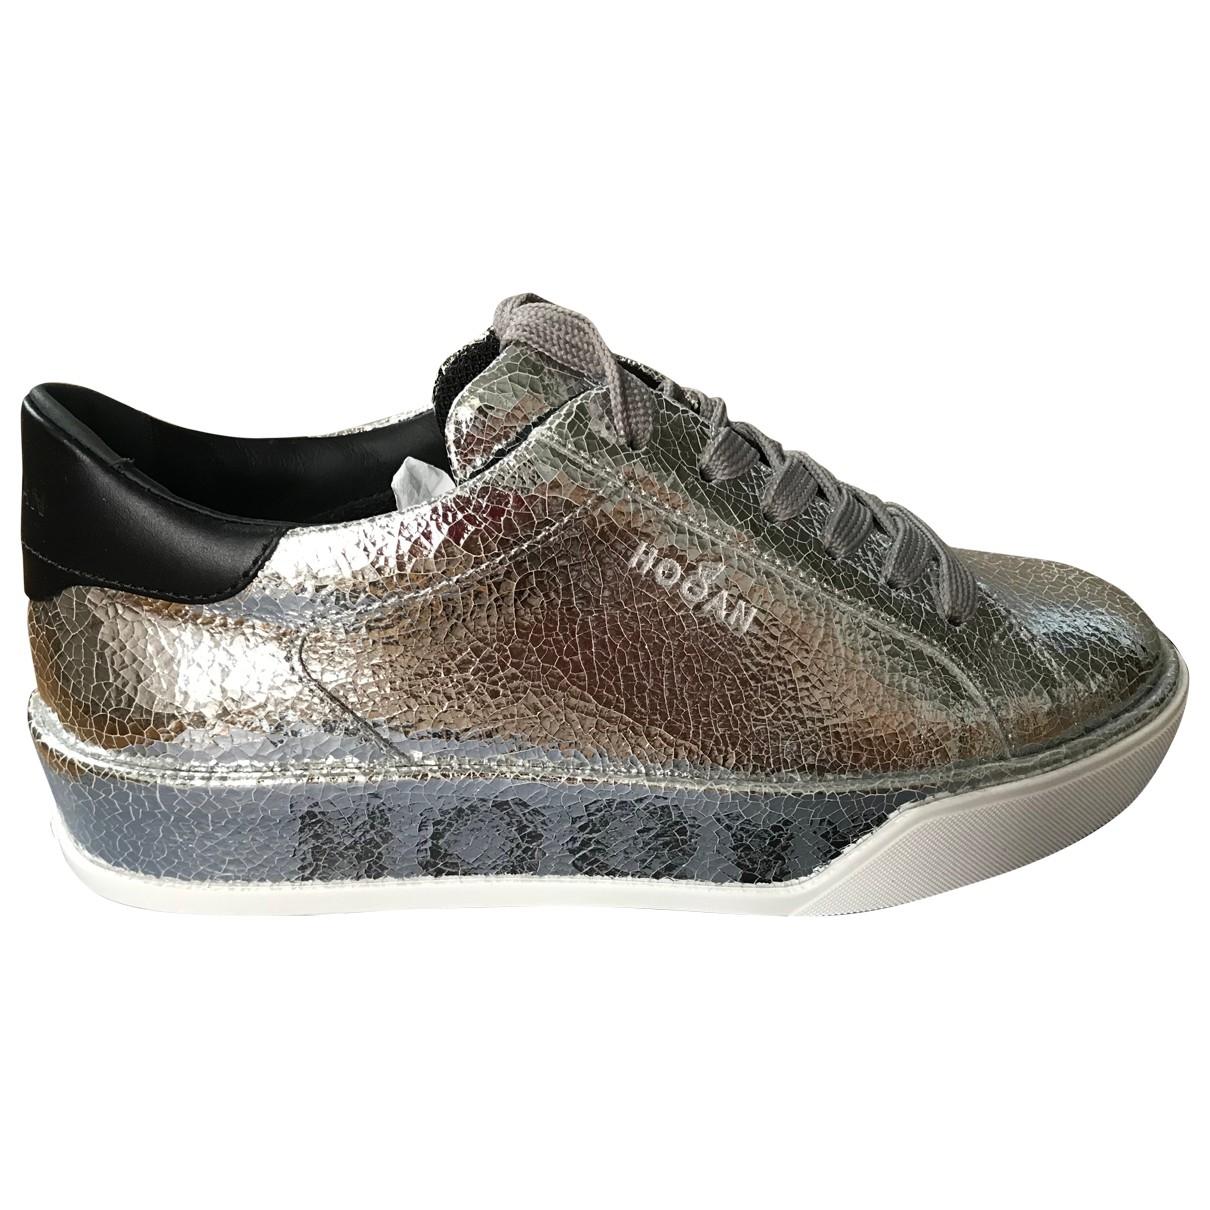 Hogan \N Metallic Leather Trainers for Women 38 EU